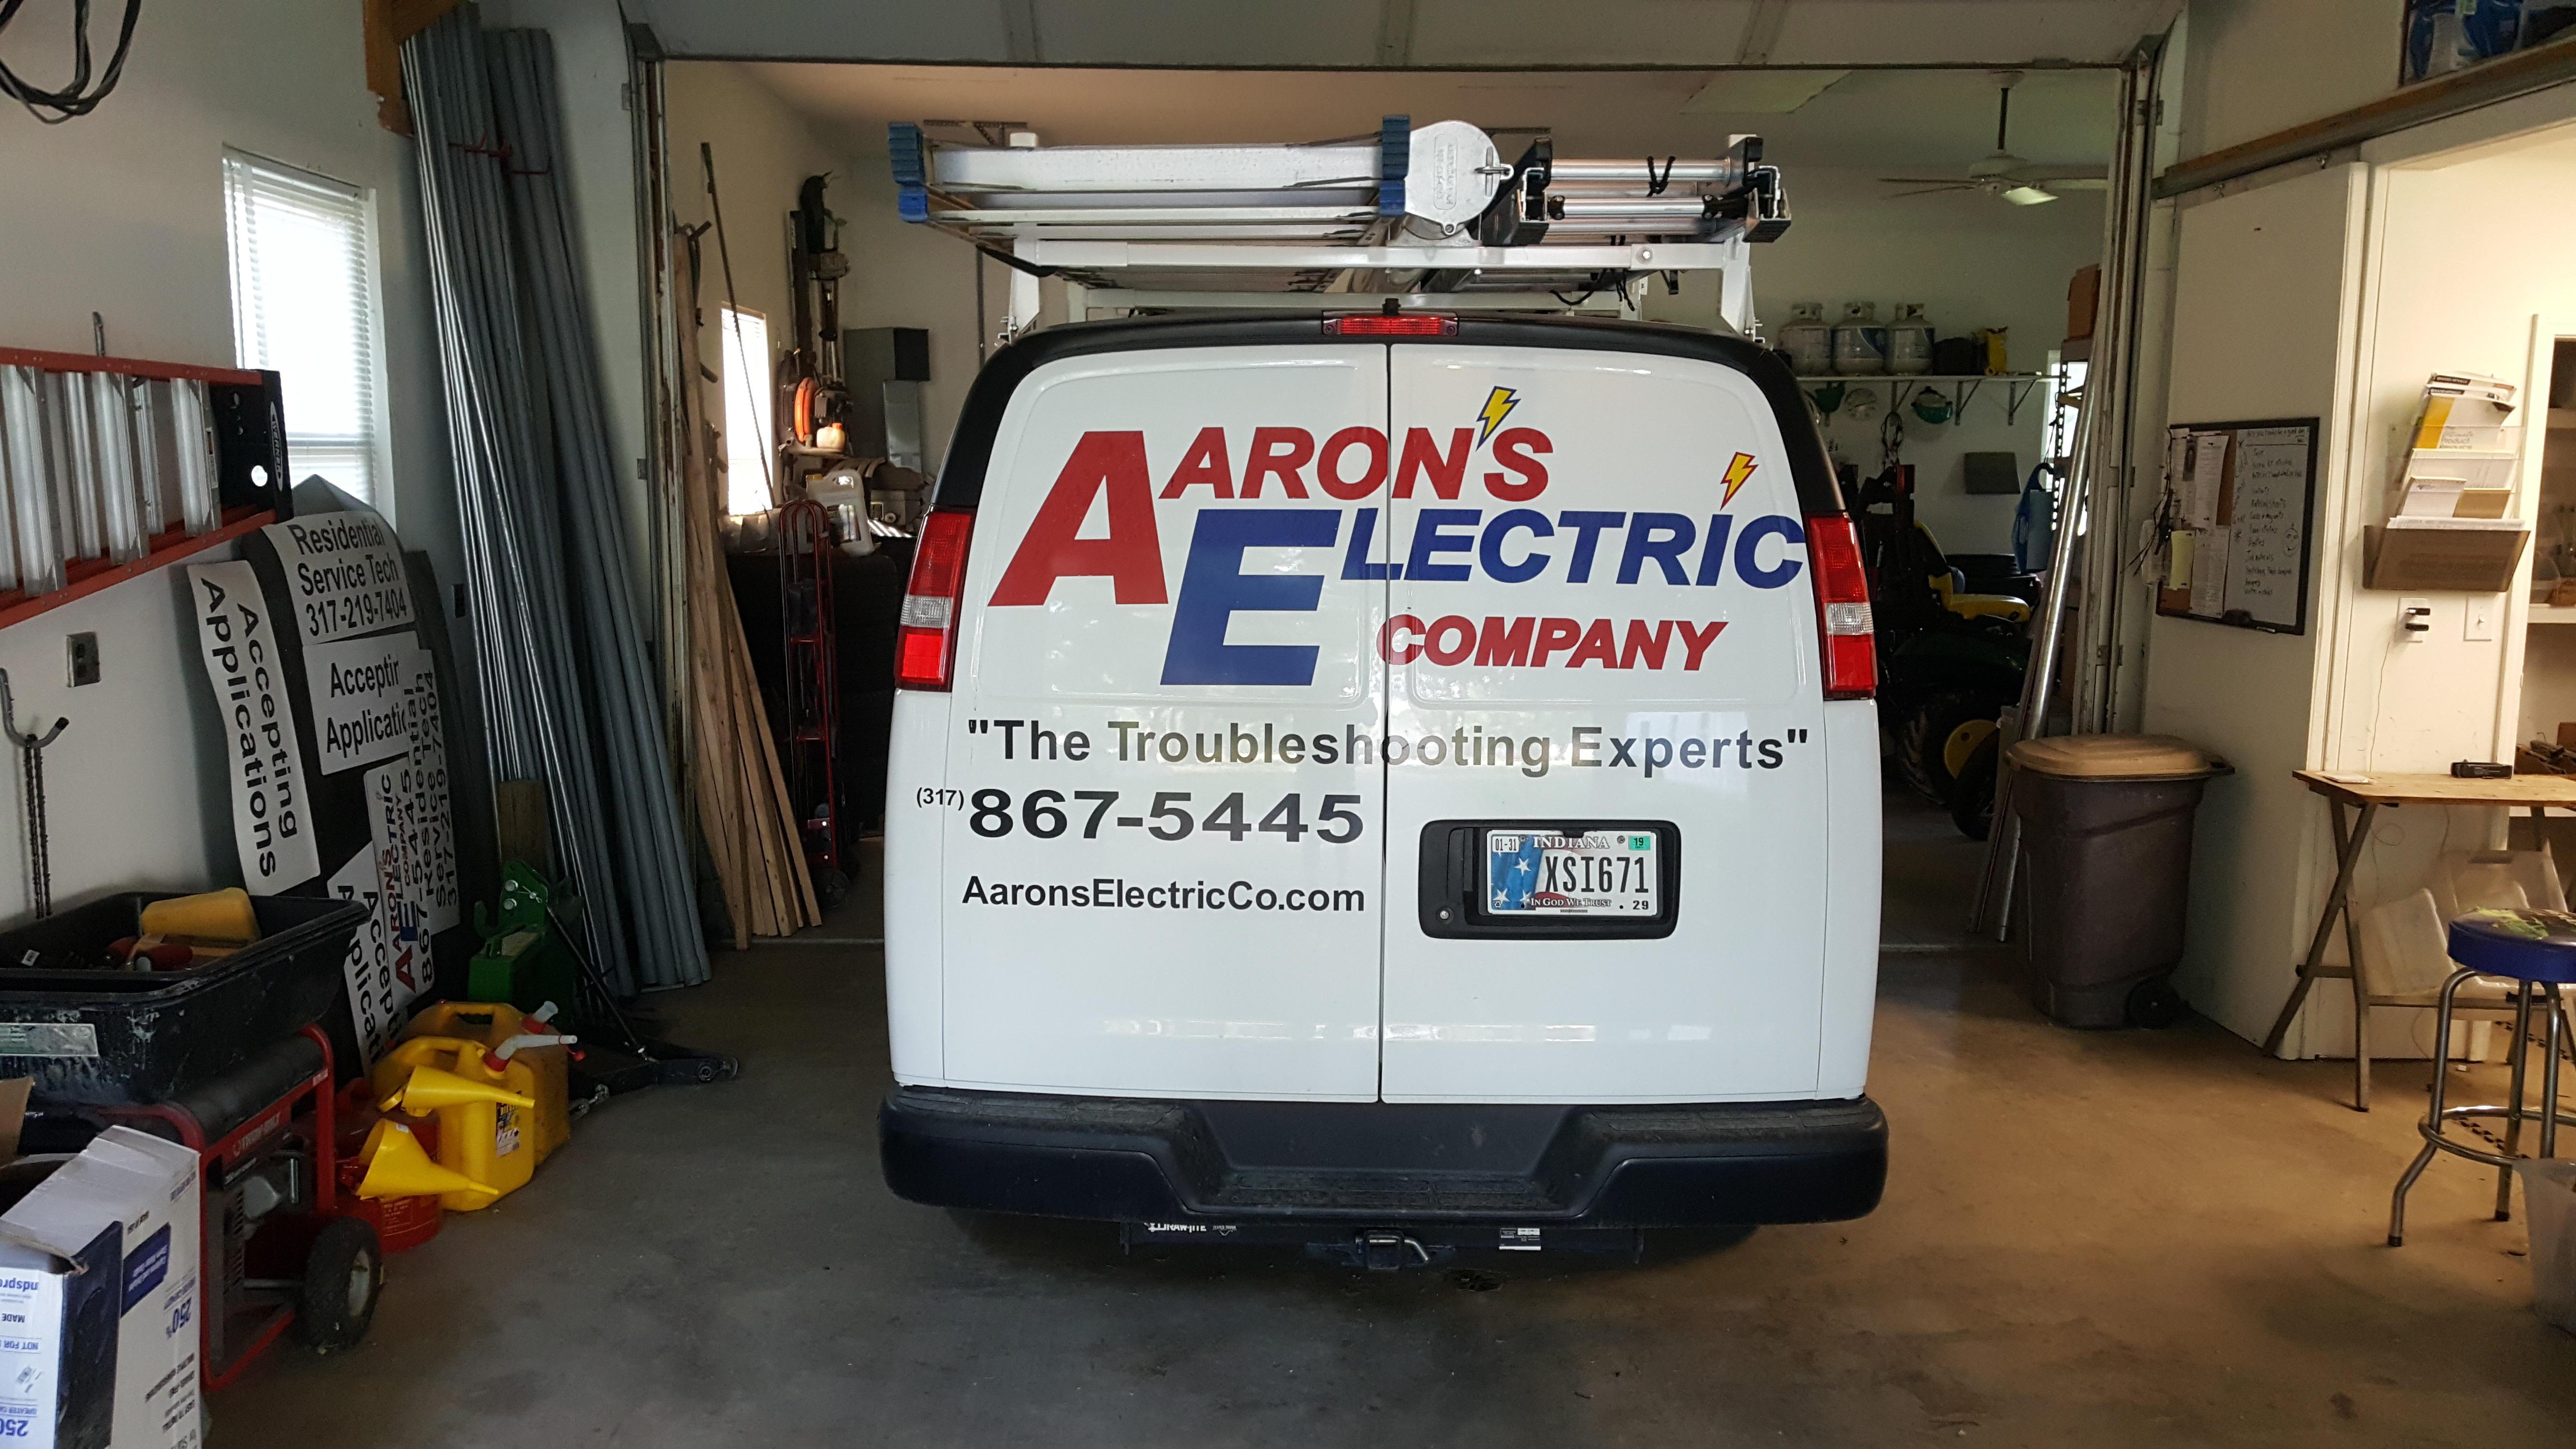 Aaron's Electric Company image 1